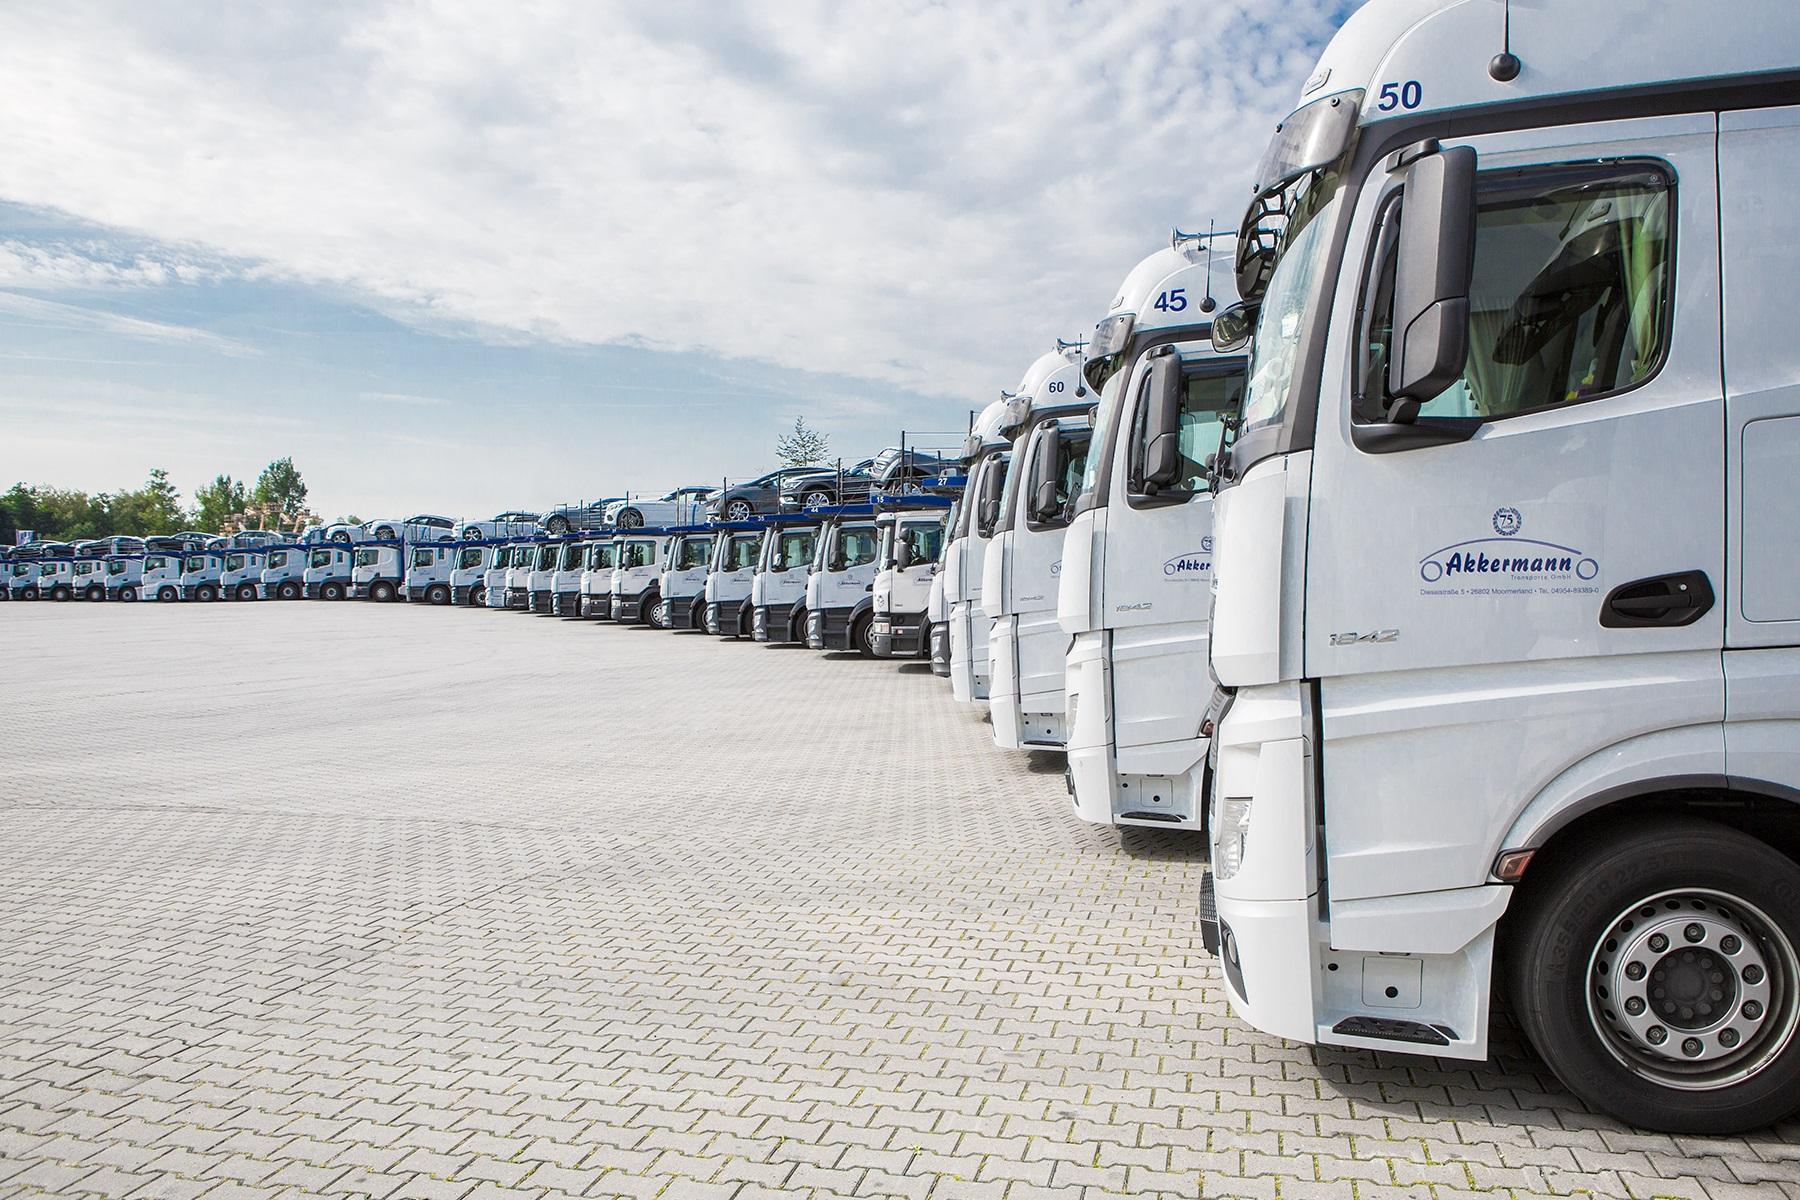 44.jpg – Akkermann Transporte GmbH